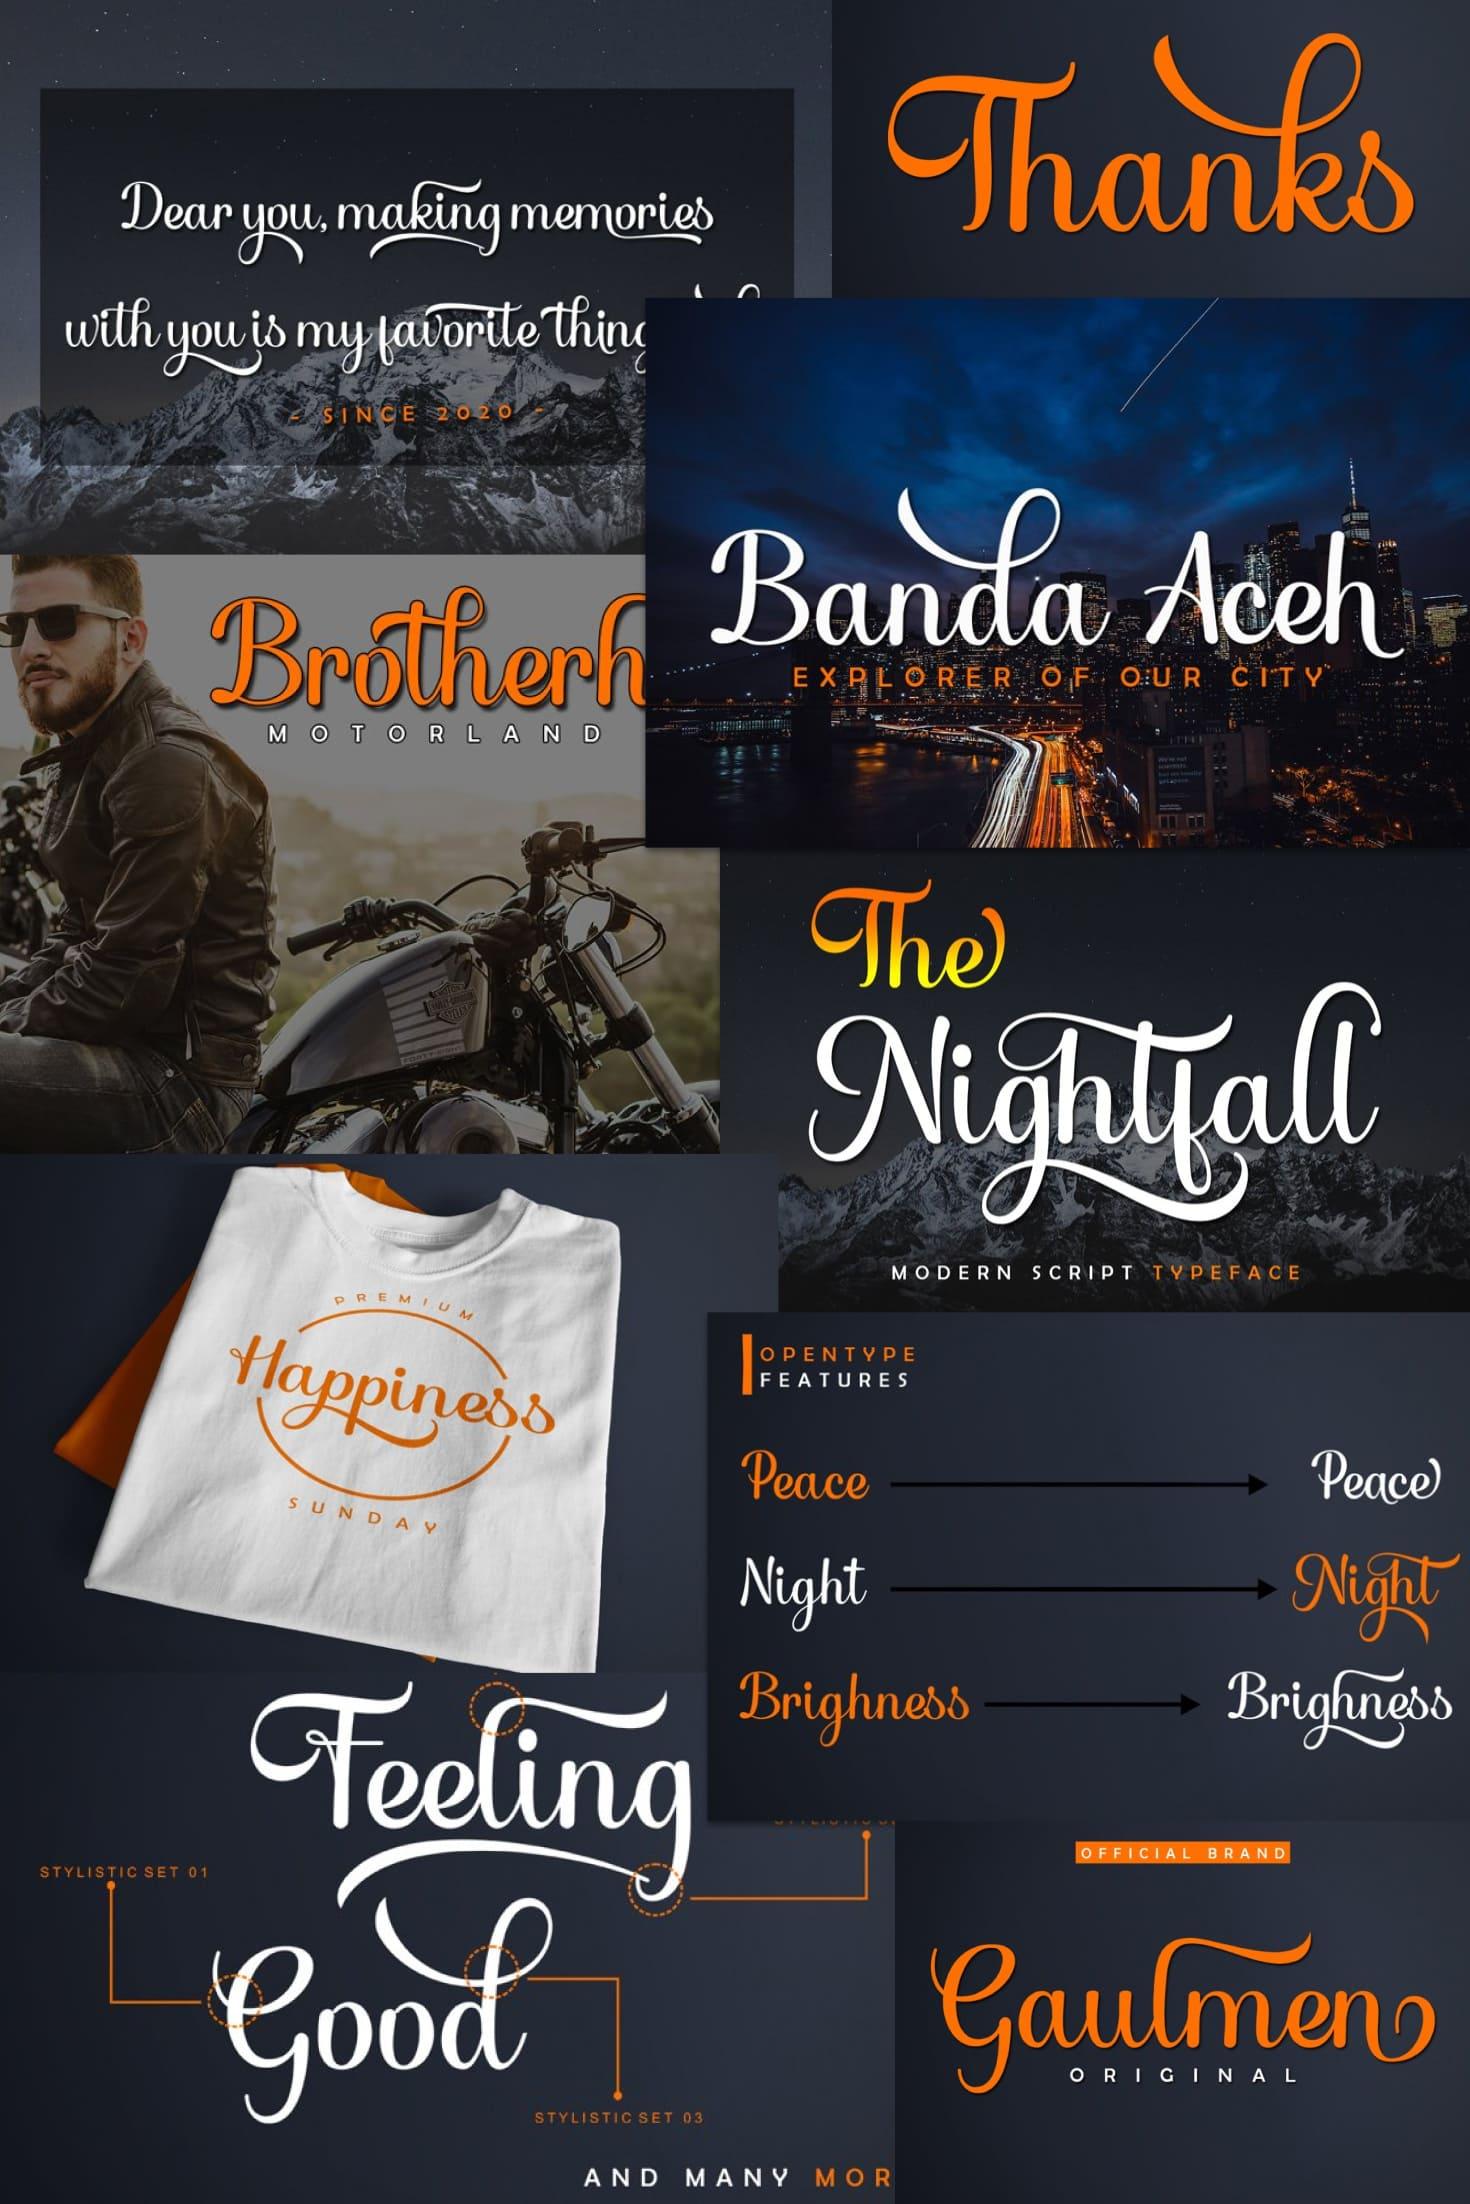 Pinterest Image: The Bold Font Nightfall OTF TTF.